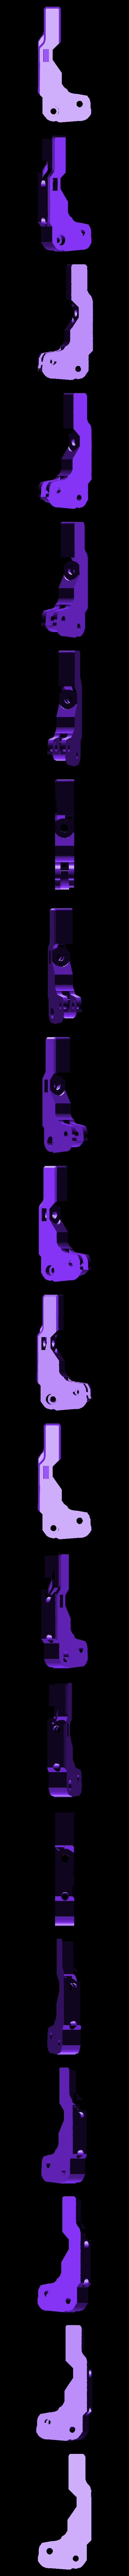 Adjustable_extended_rounded_one-piece_extruder_lever.stl Download free STL file Adjustable, one-piece, extended, rounded, extruder lever • 3D printer template, FedorSosnin